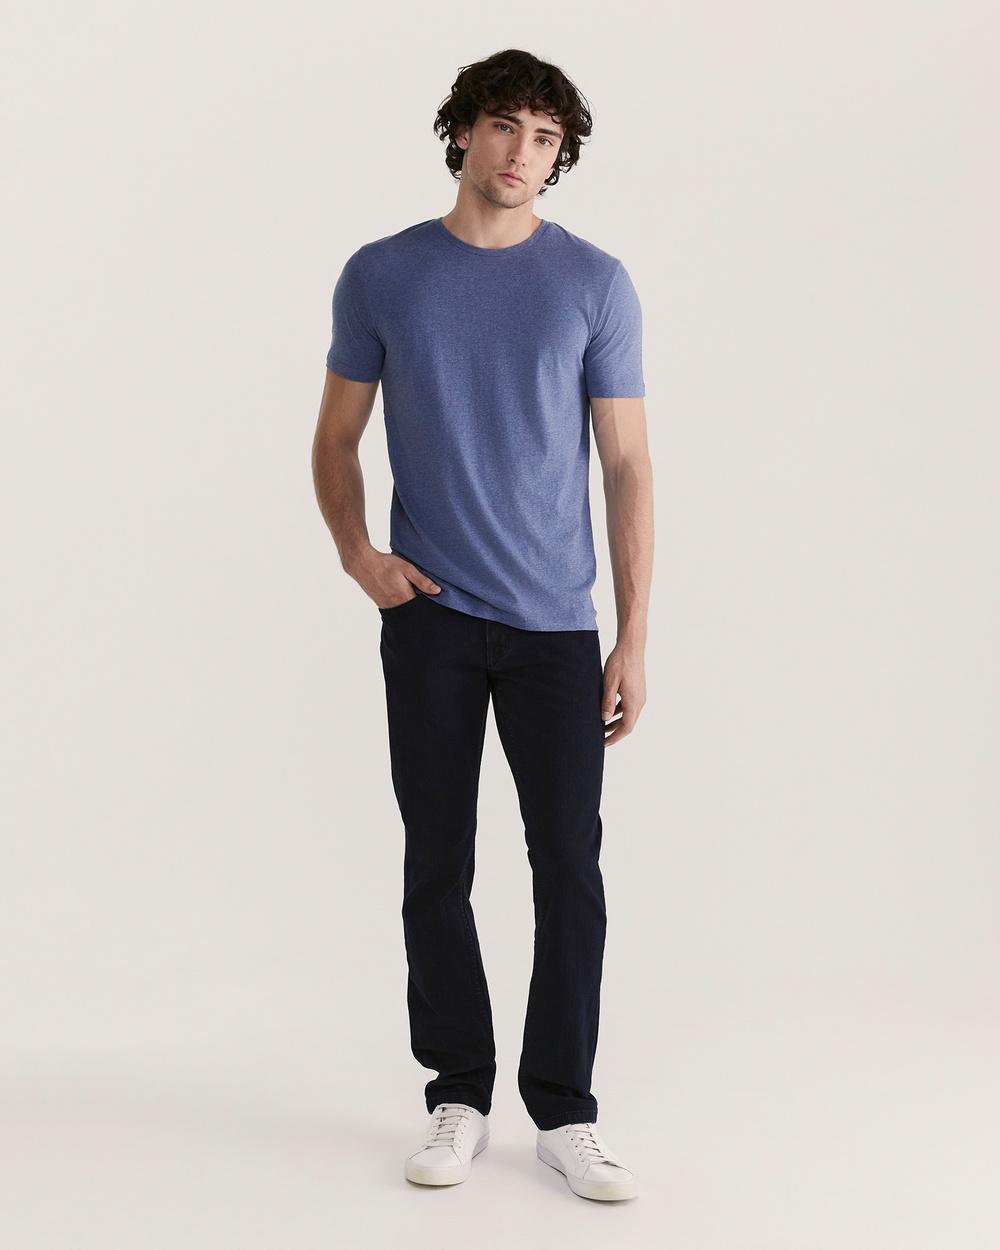 SABA - Daniel Crew Neck Tee - T-Shirts & Singlets (navy) Daniel Crew Neck Tee